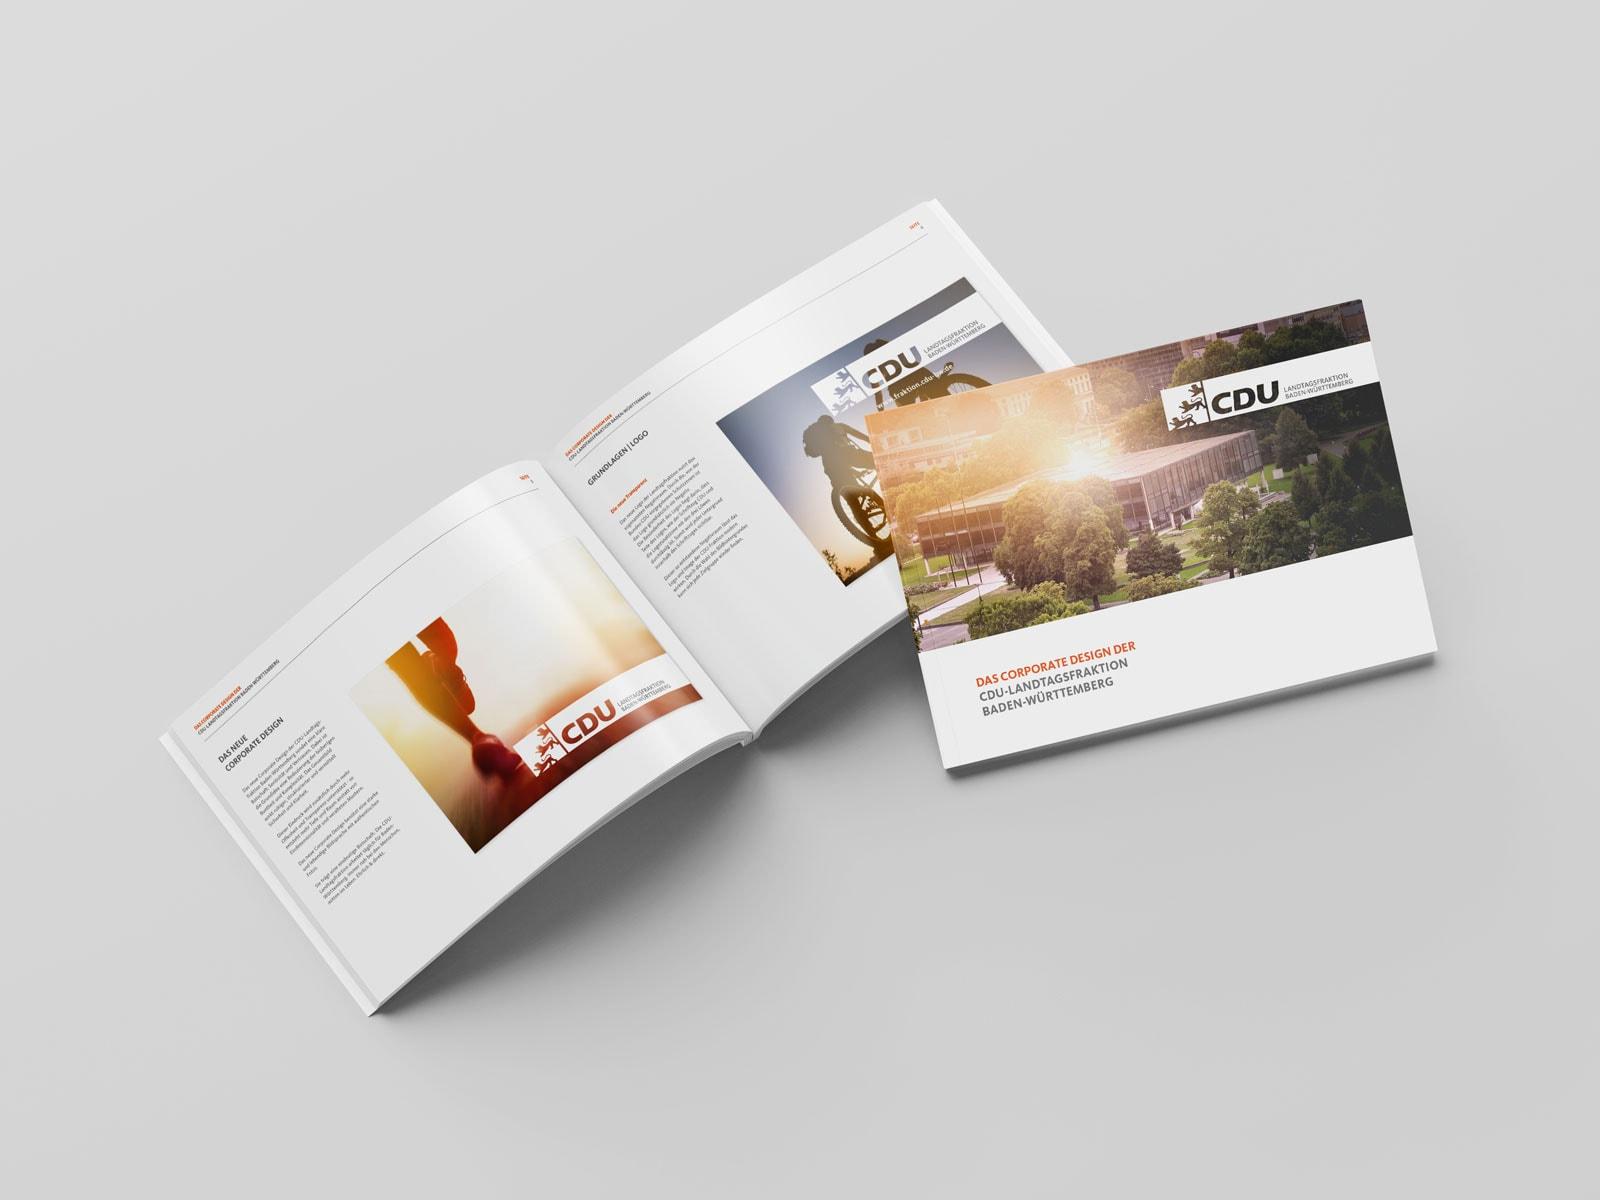 CDU_LF_BW, Styleguide, Corporate Design Relaunch, Redesign, Inhalt, Logo Anwendung